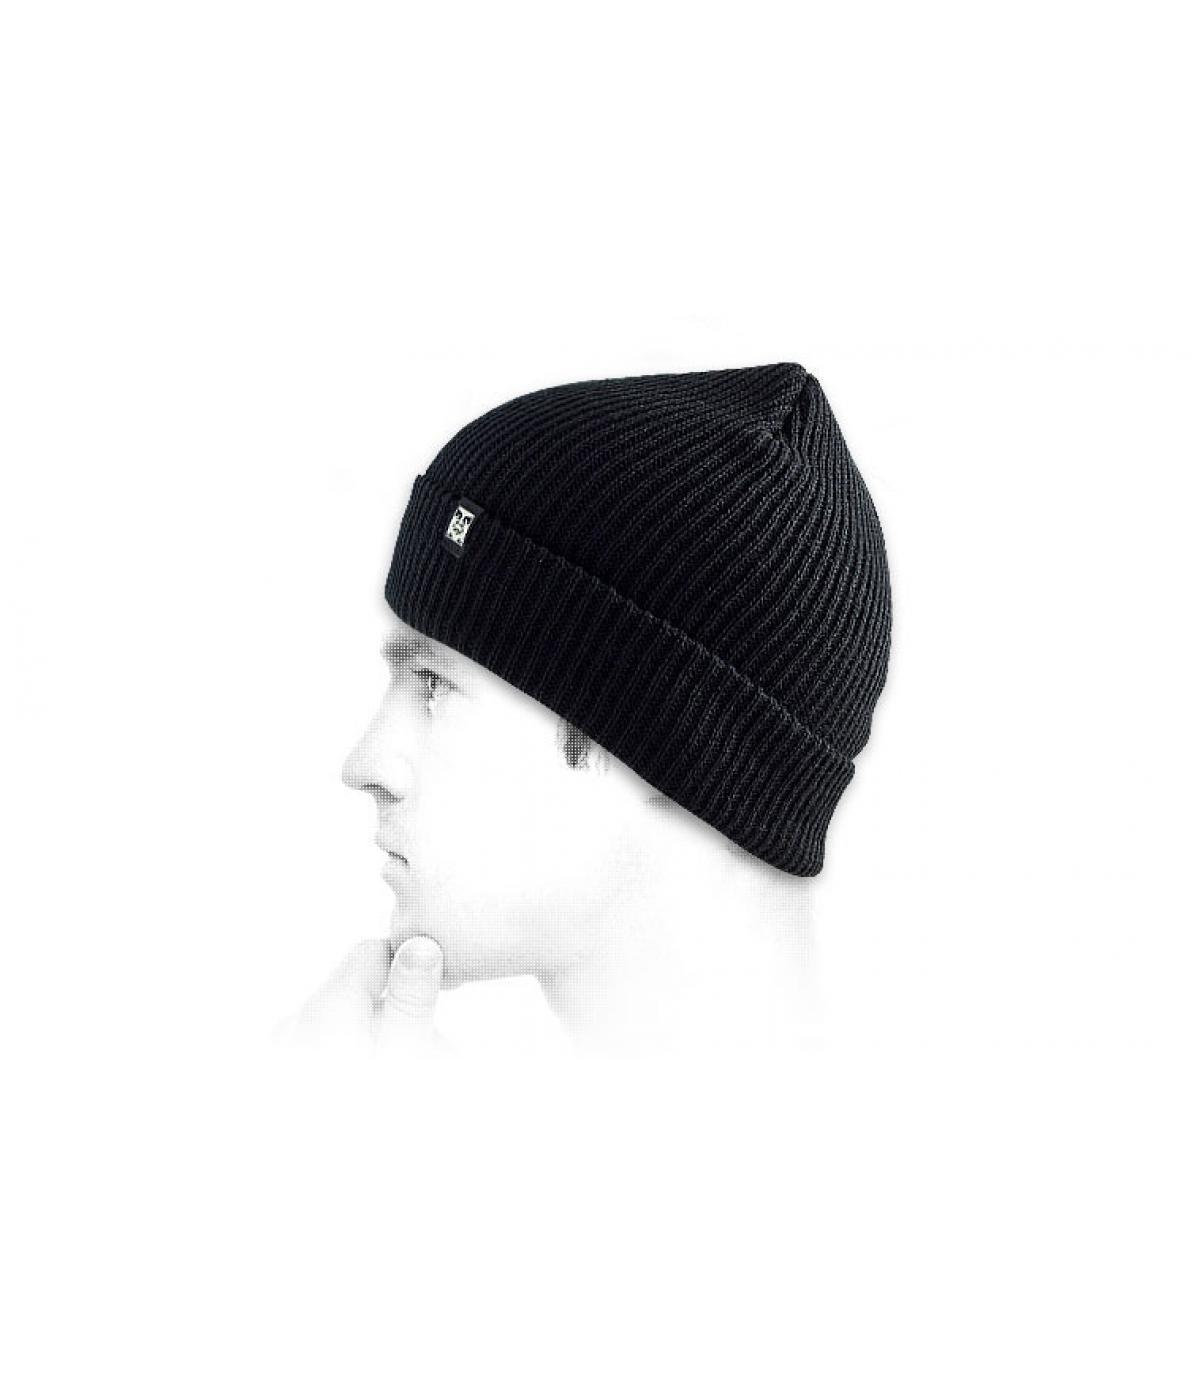 Bonnet ruger noir